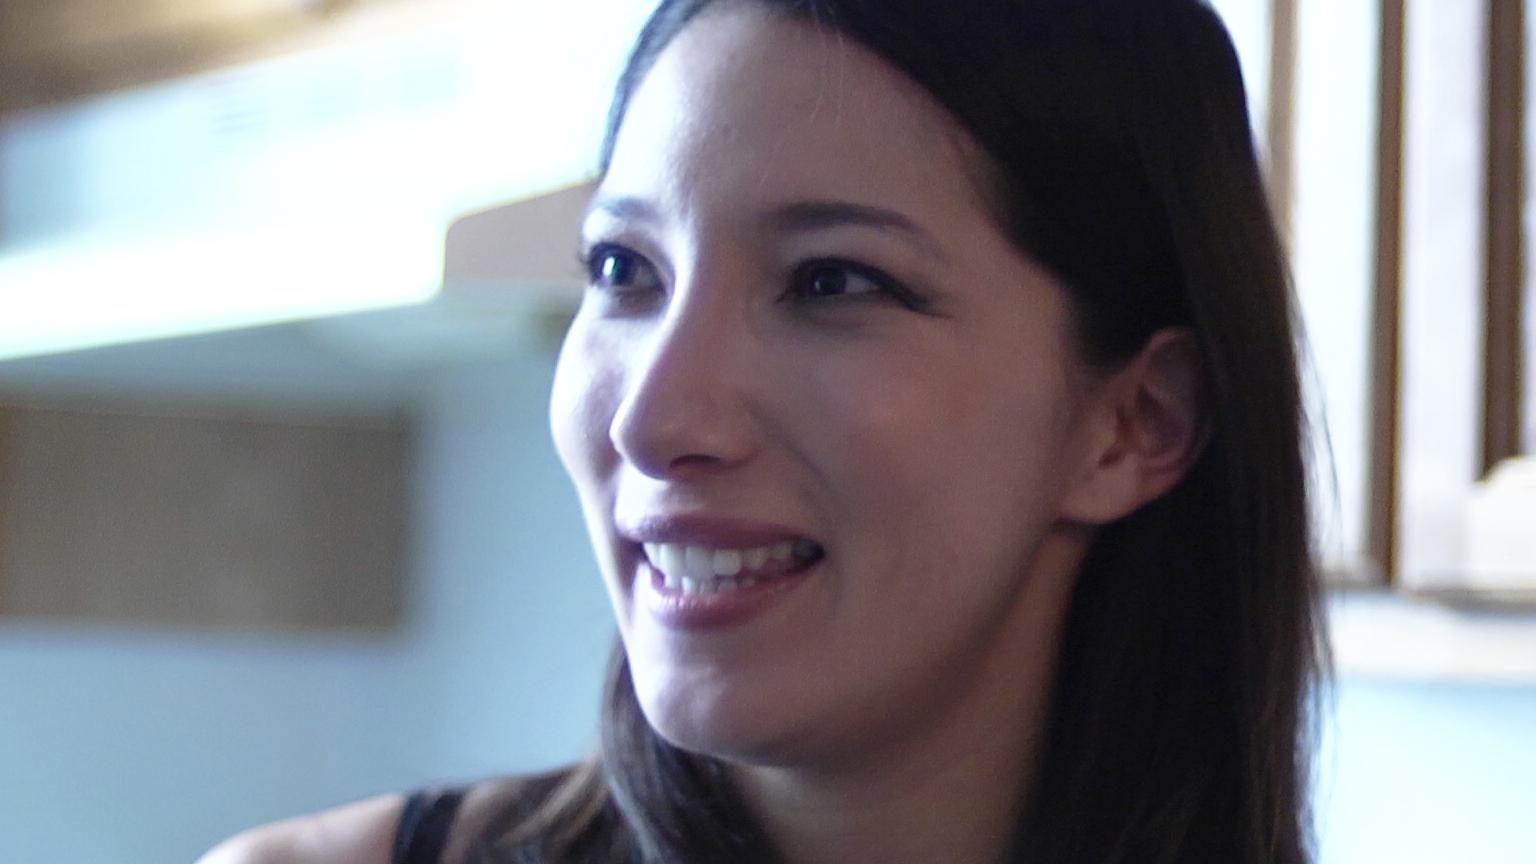 Tanya Gabrielian – activist and award-winning pianist